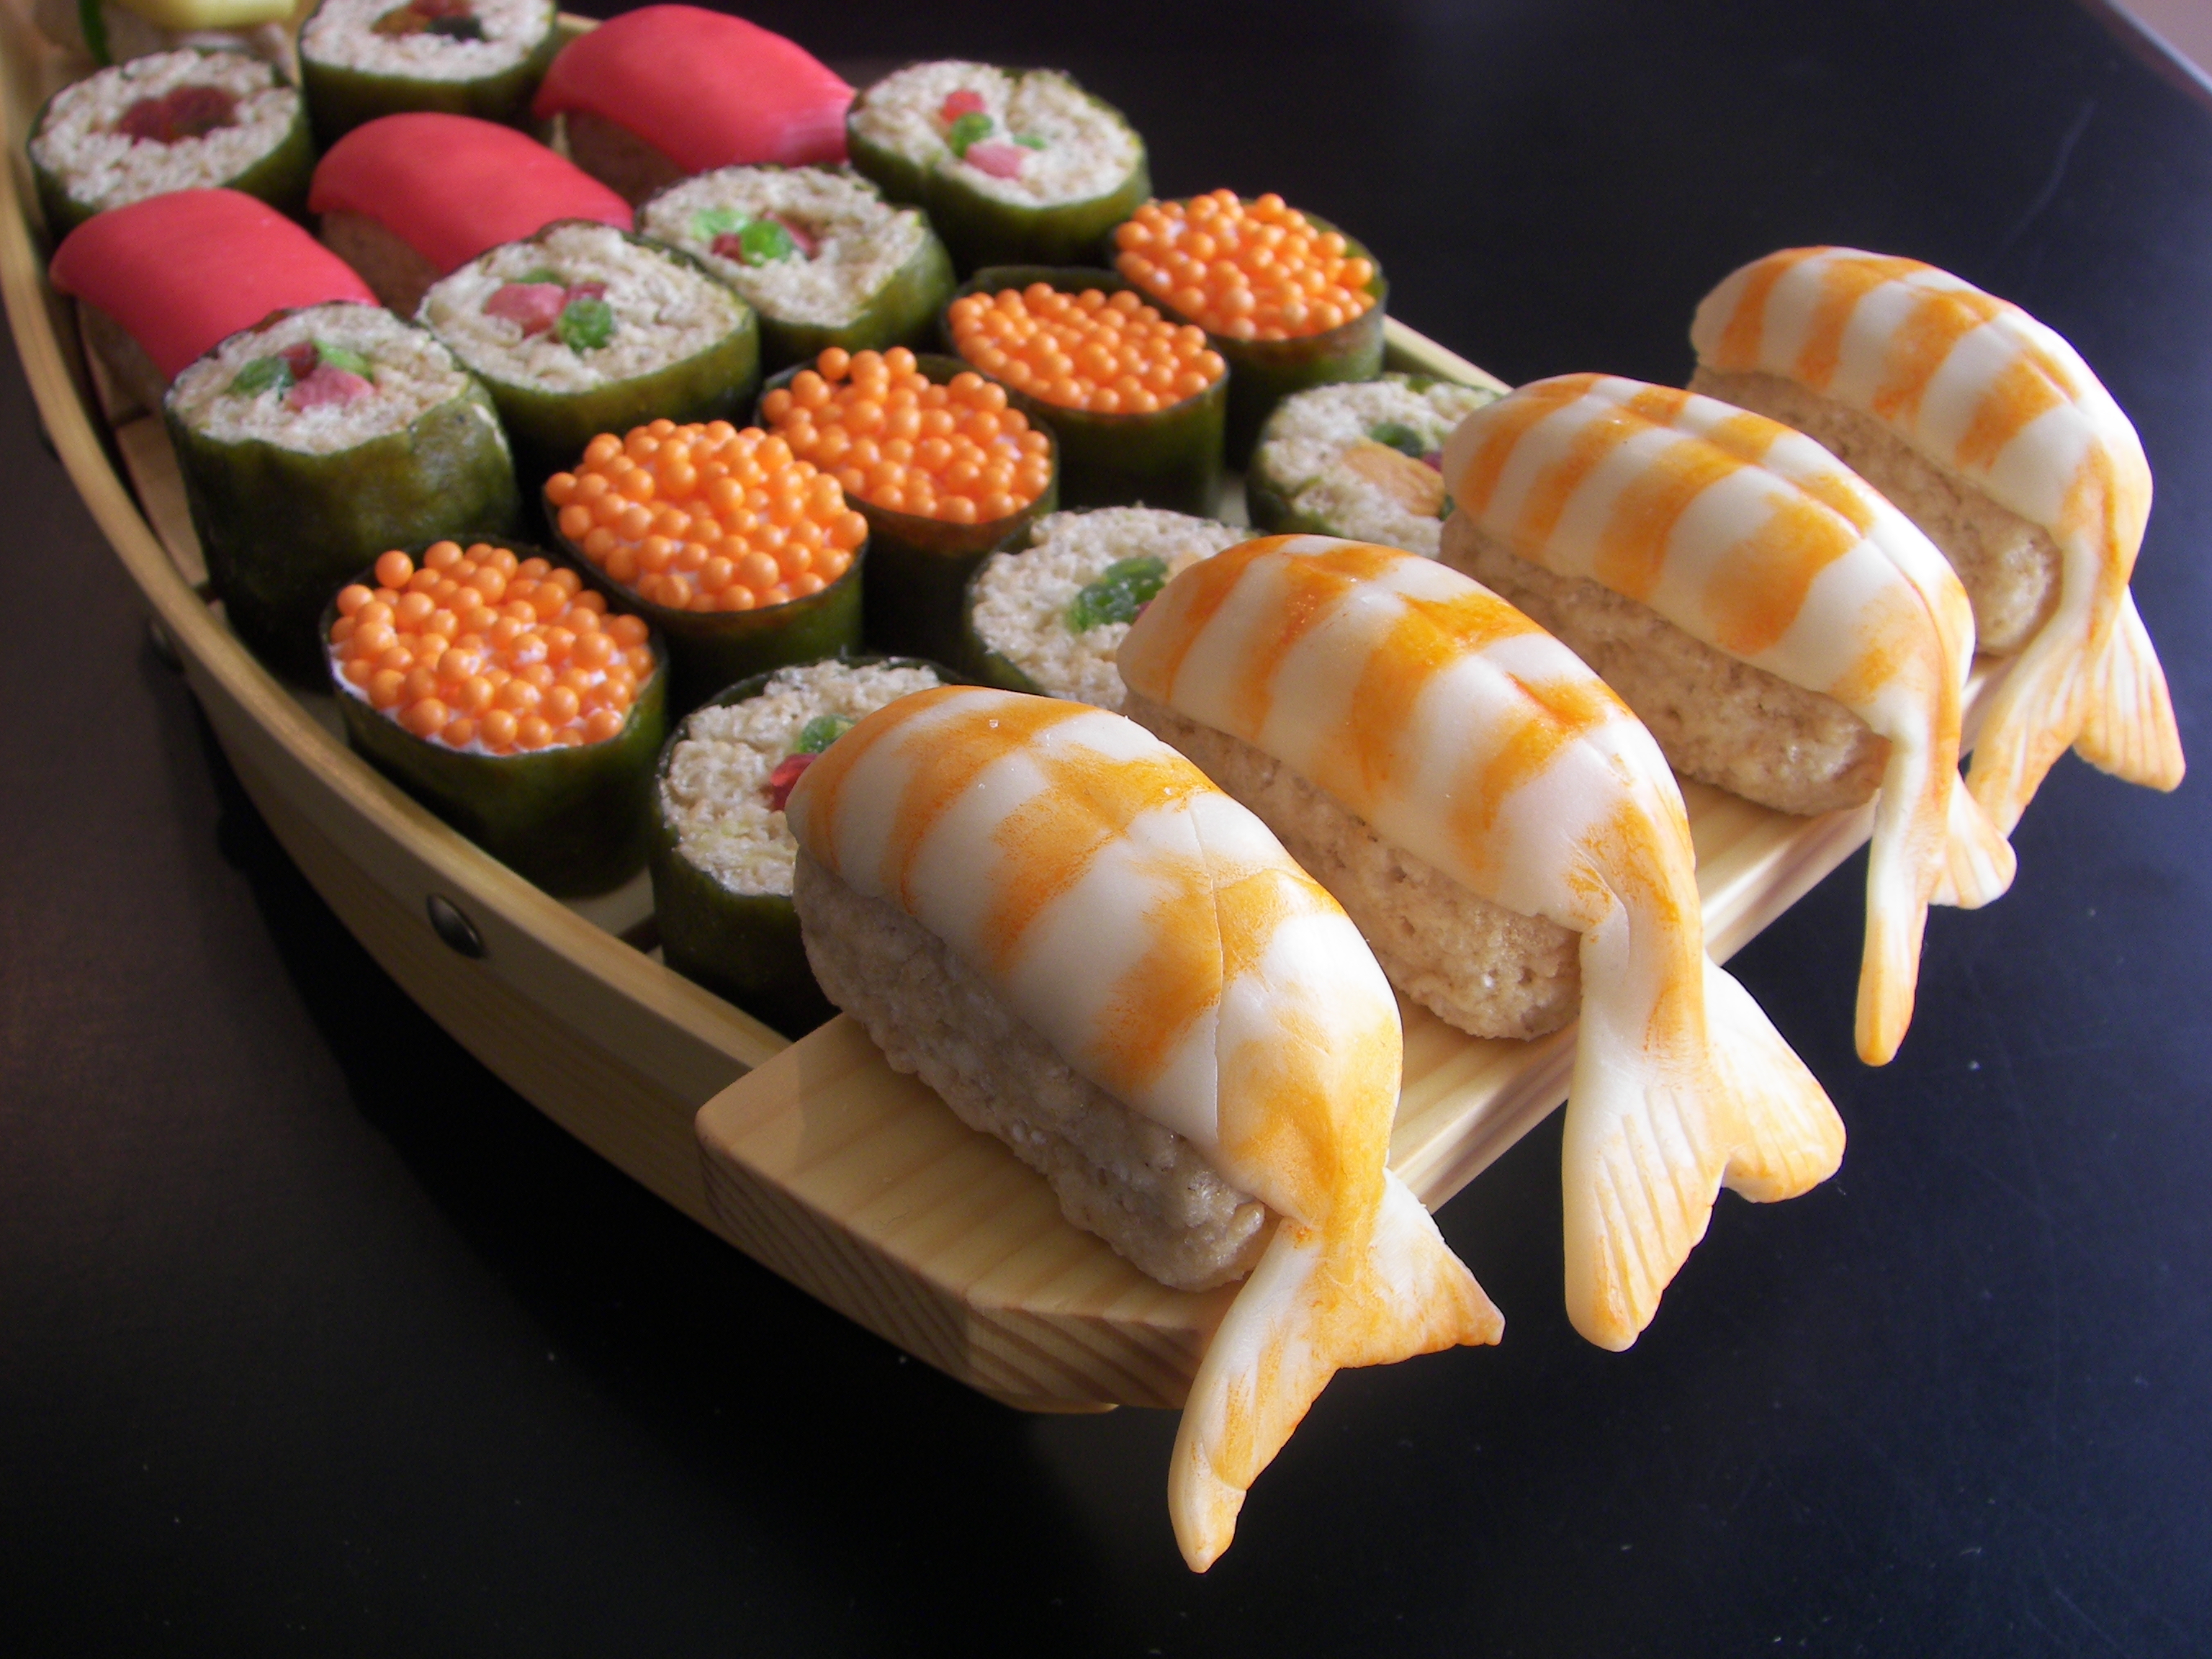 dessert sushi | Flickr - Photo Sharing!